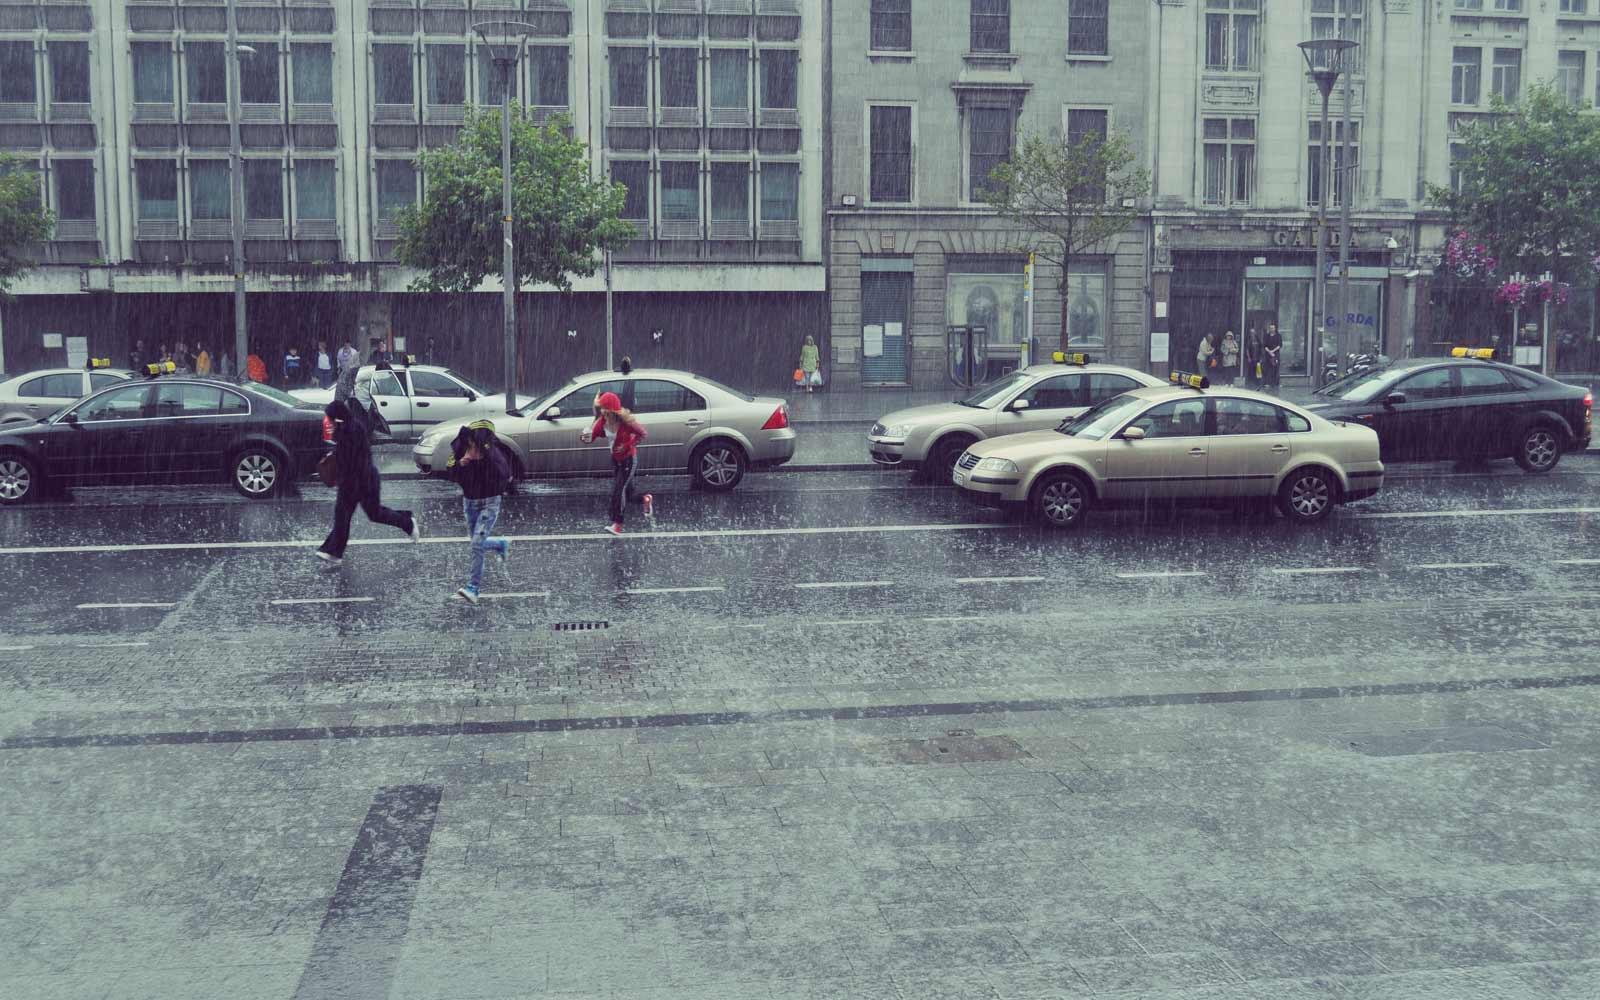 Regenwetter in Dublin